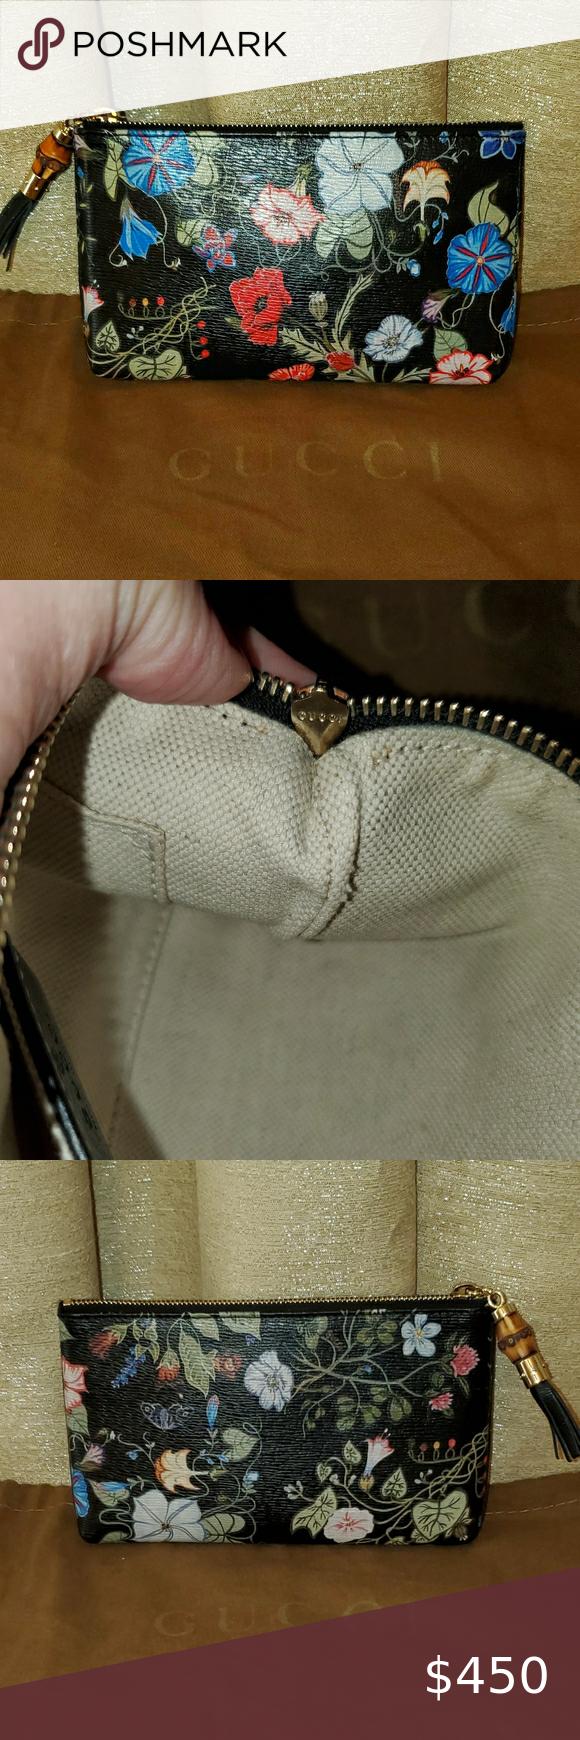 Bolso de mano Gucci Flora Kris Knight  – Bolsa